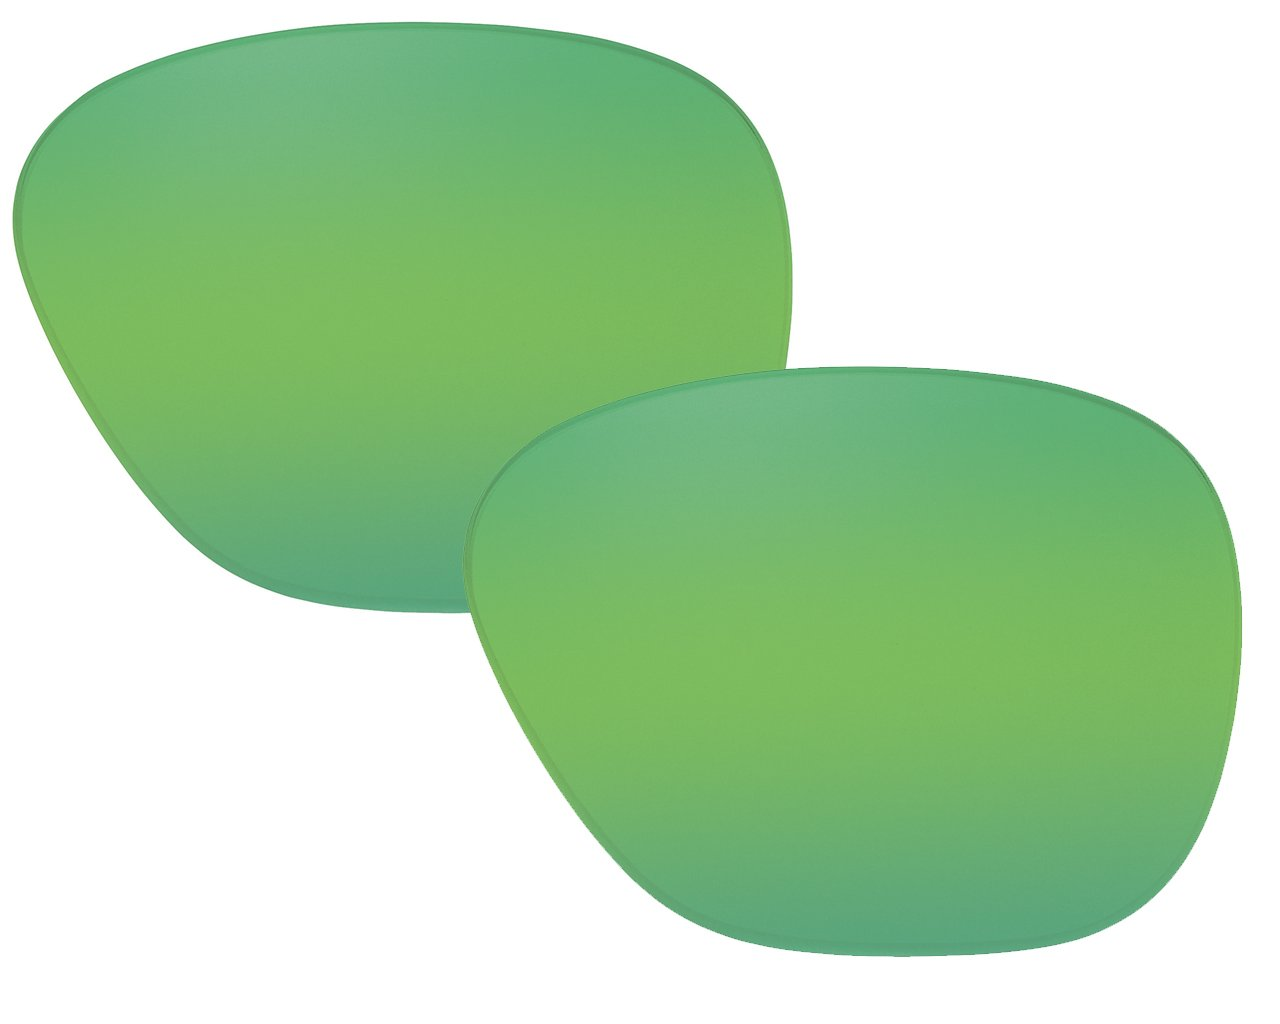 Suncloud Optics Sentry Authentic Replacement Polarized Lenses (Green Mirror Lens)